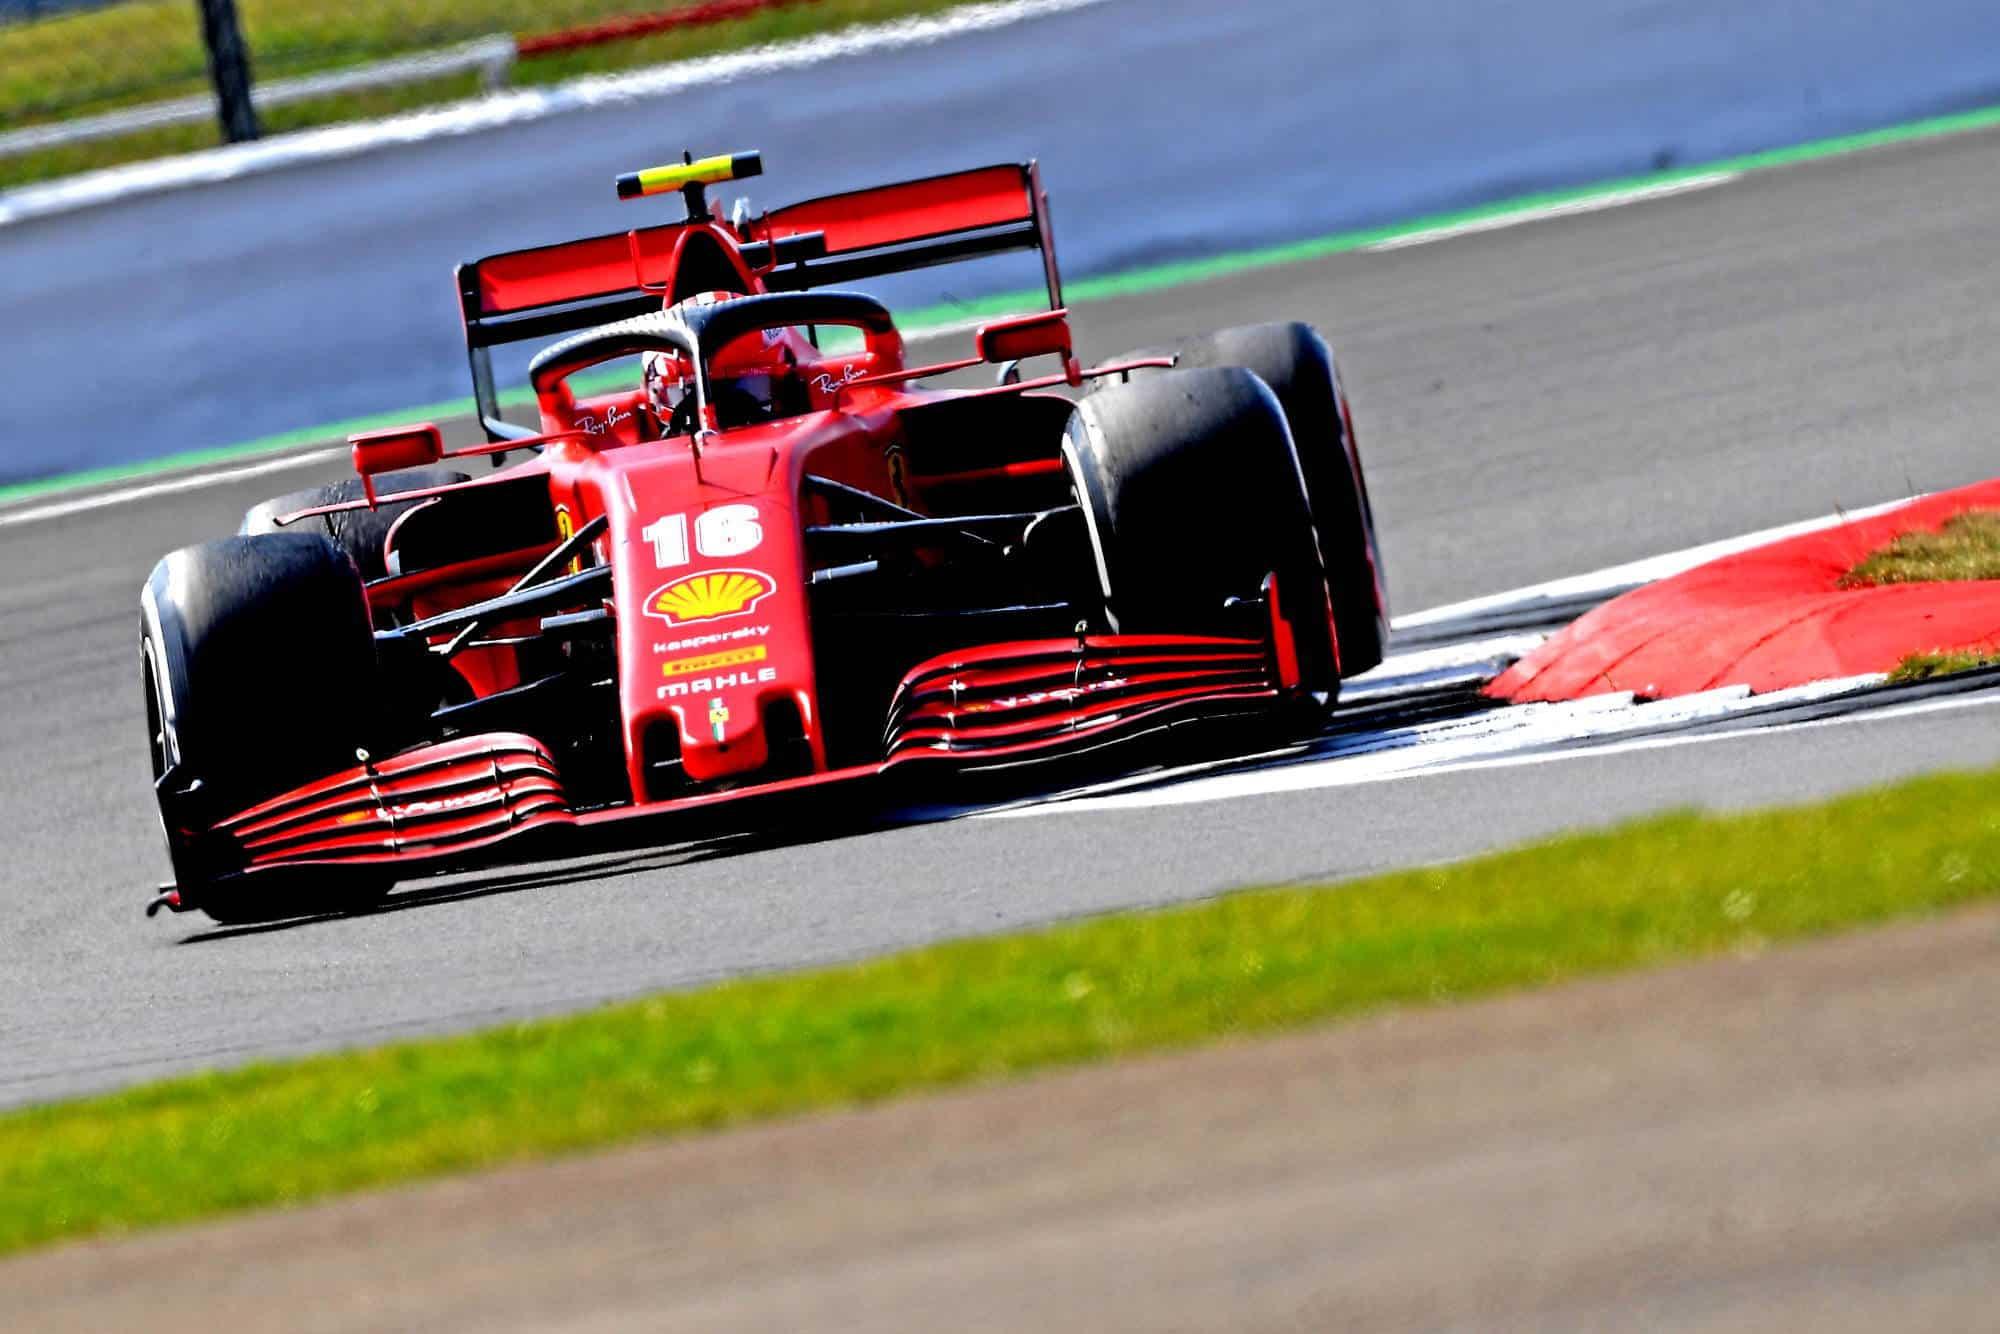 2020 70th Anniversary GP Leclerc soft Pirelli Photo Ferrari